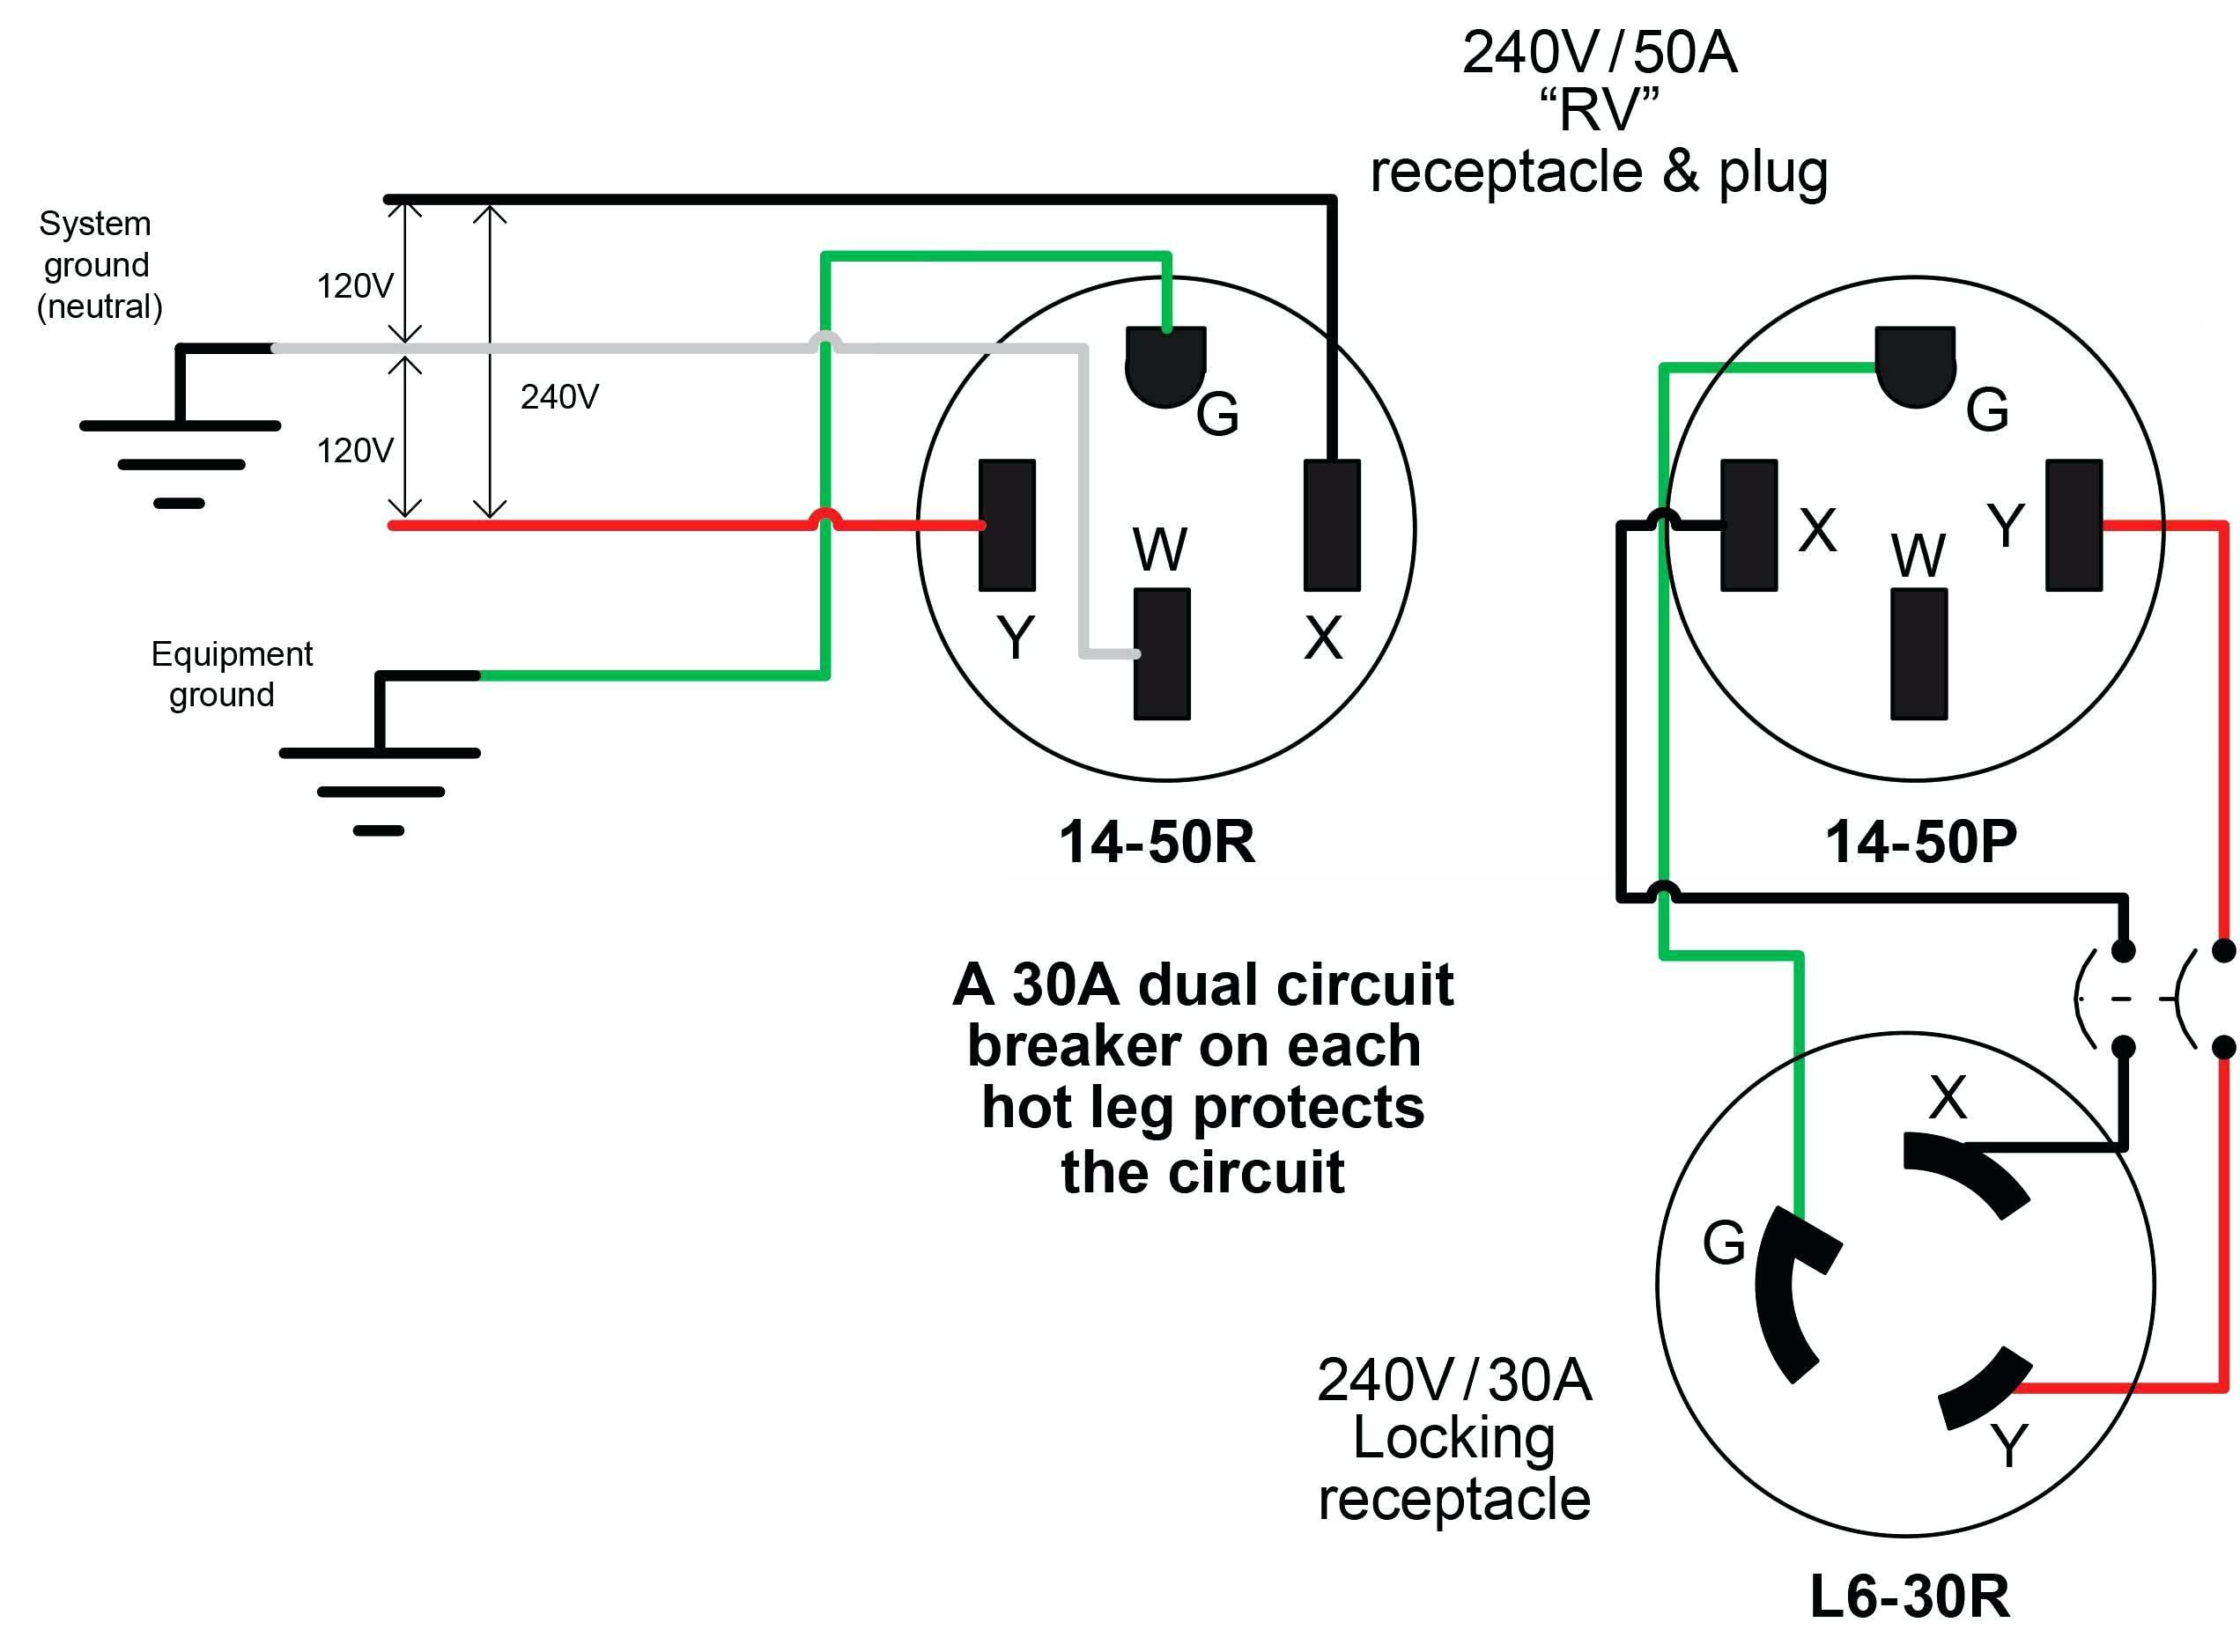 nema 14 plug wiring detailed schematics diagram rh drphilipharris com L15-30R  Wiring- Diagram Nema L21-30R